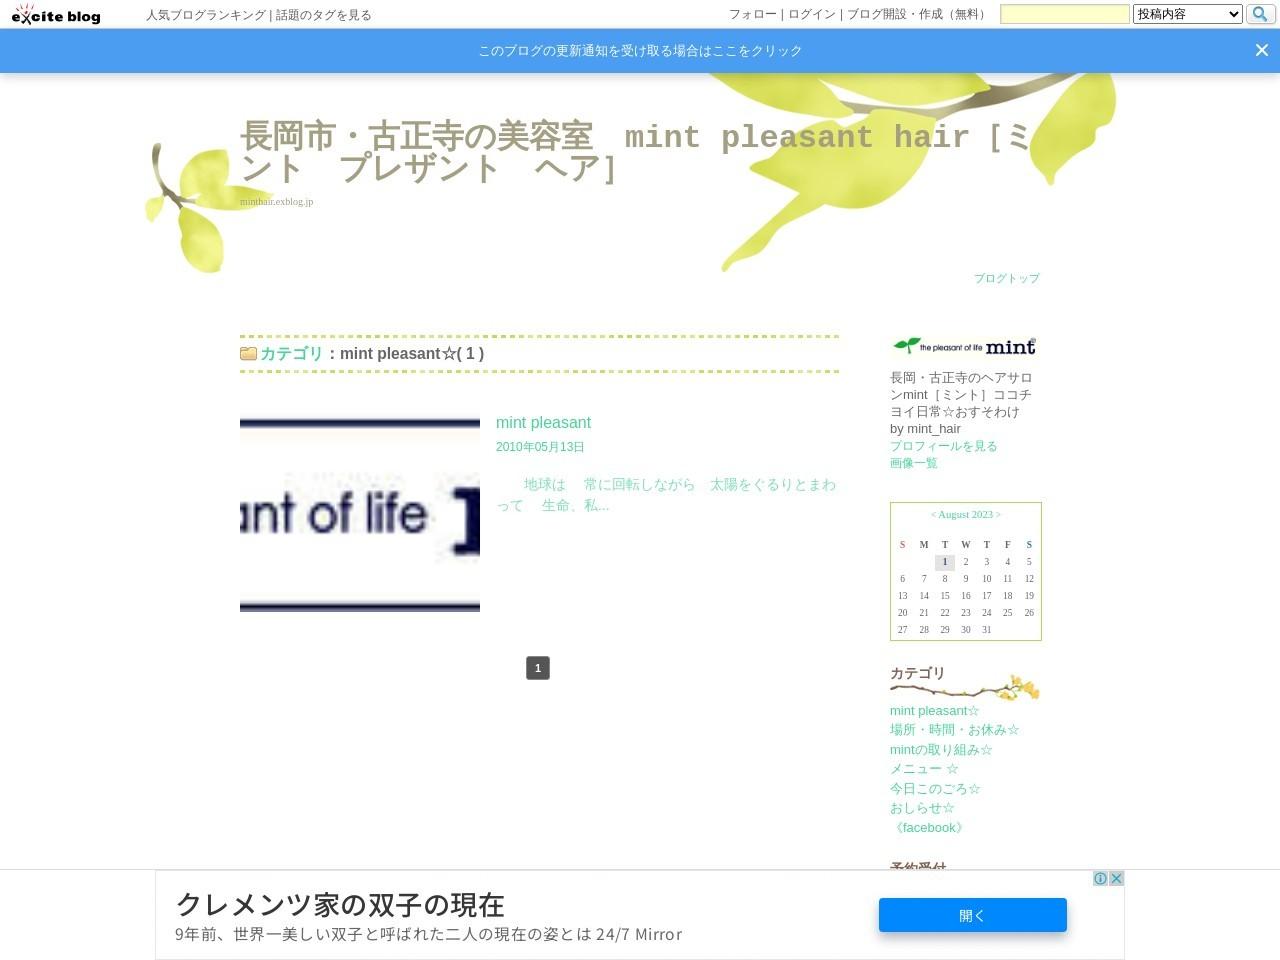 mint pleasant hair (ミント プレザント ヘア)